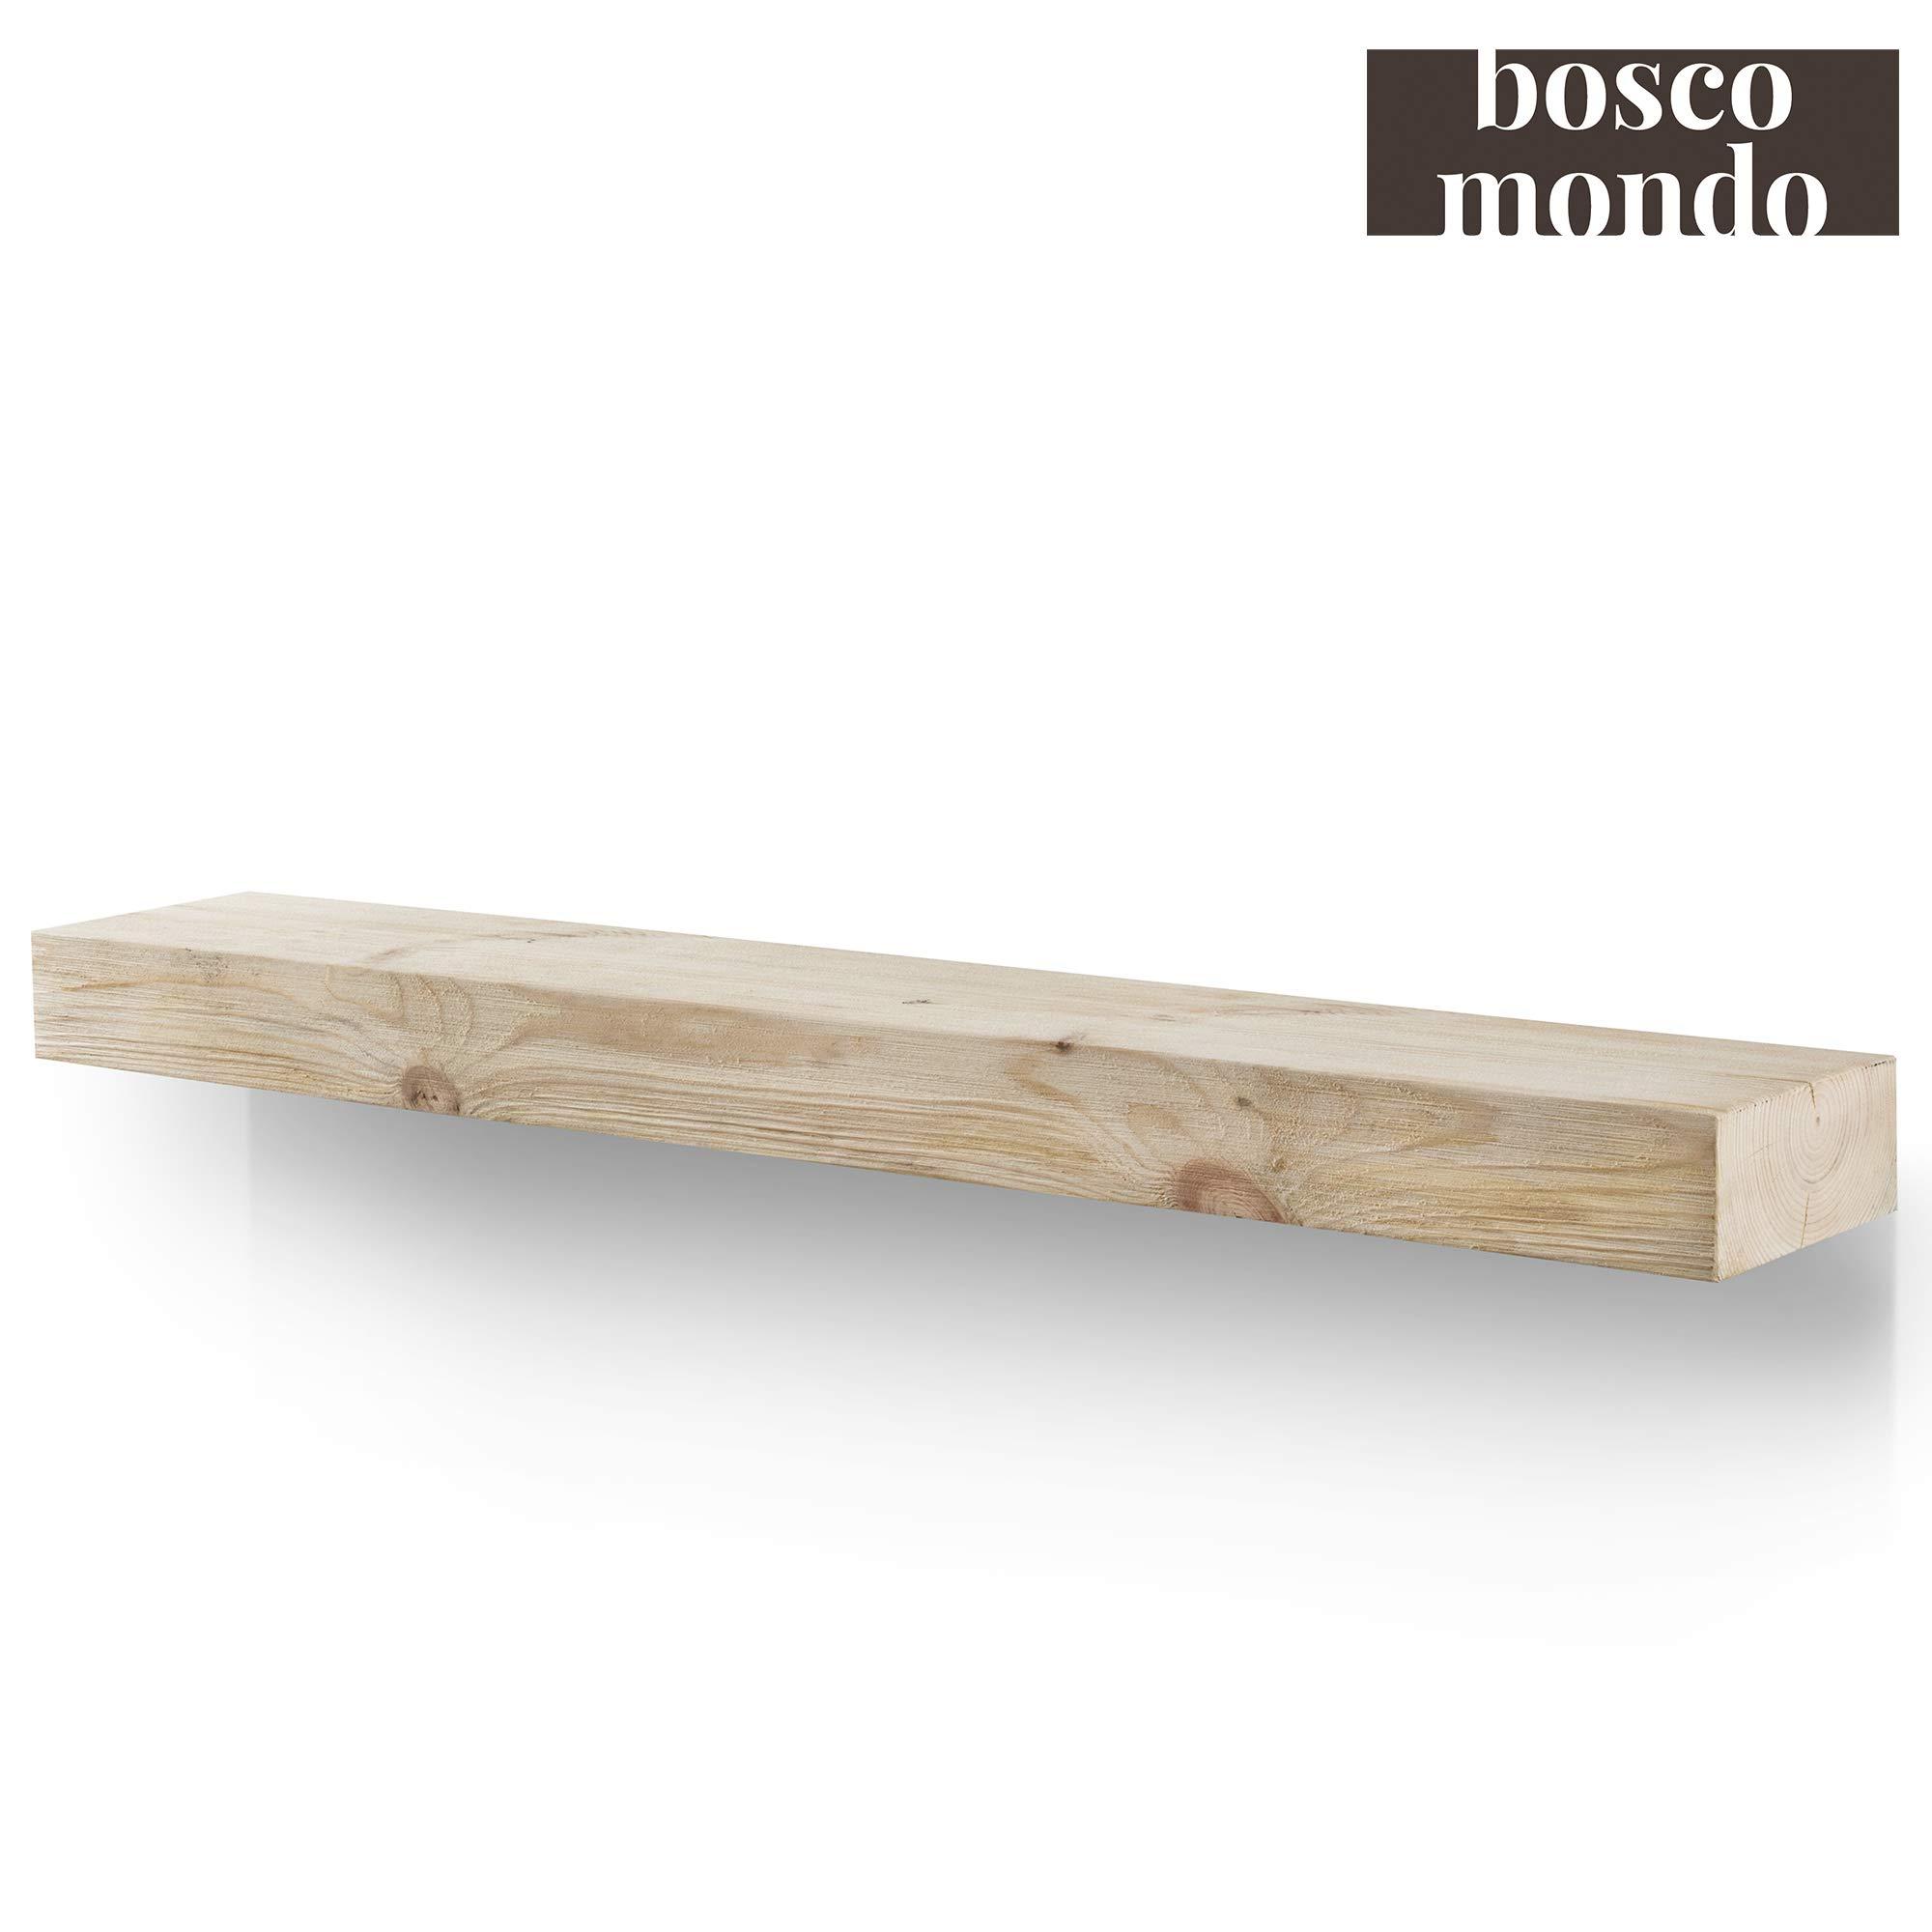 BoscoMondo Rustic Fireplace Mantel Floating Shelf - 72'' X 7'' X 3'' Solid Pine Wood - Wall Decor, Mounted Farmhouse Shelving - Invisible Heavy Duty Bracket (Unfinished, 72'') by BoscoMondo